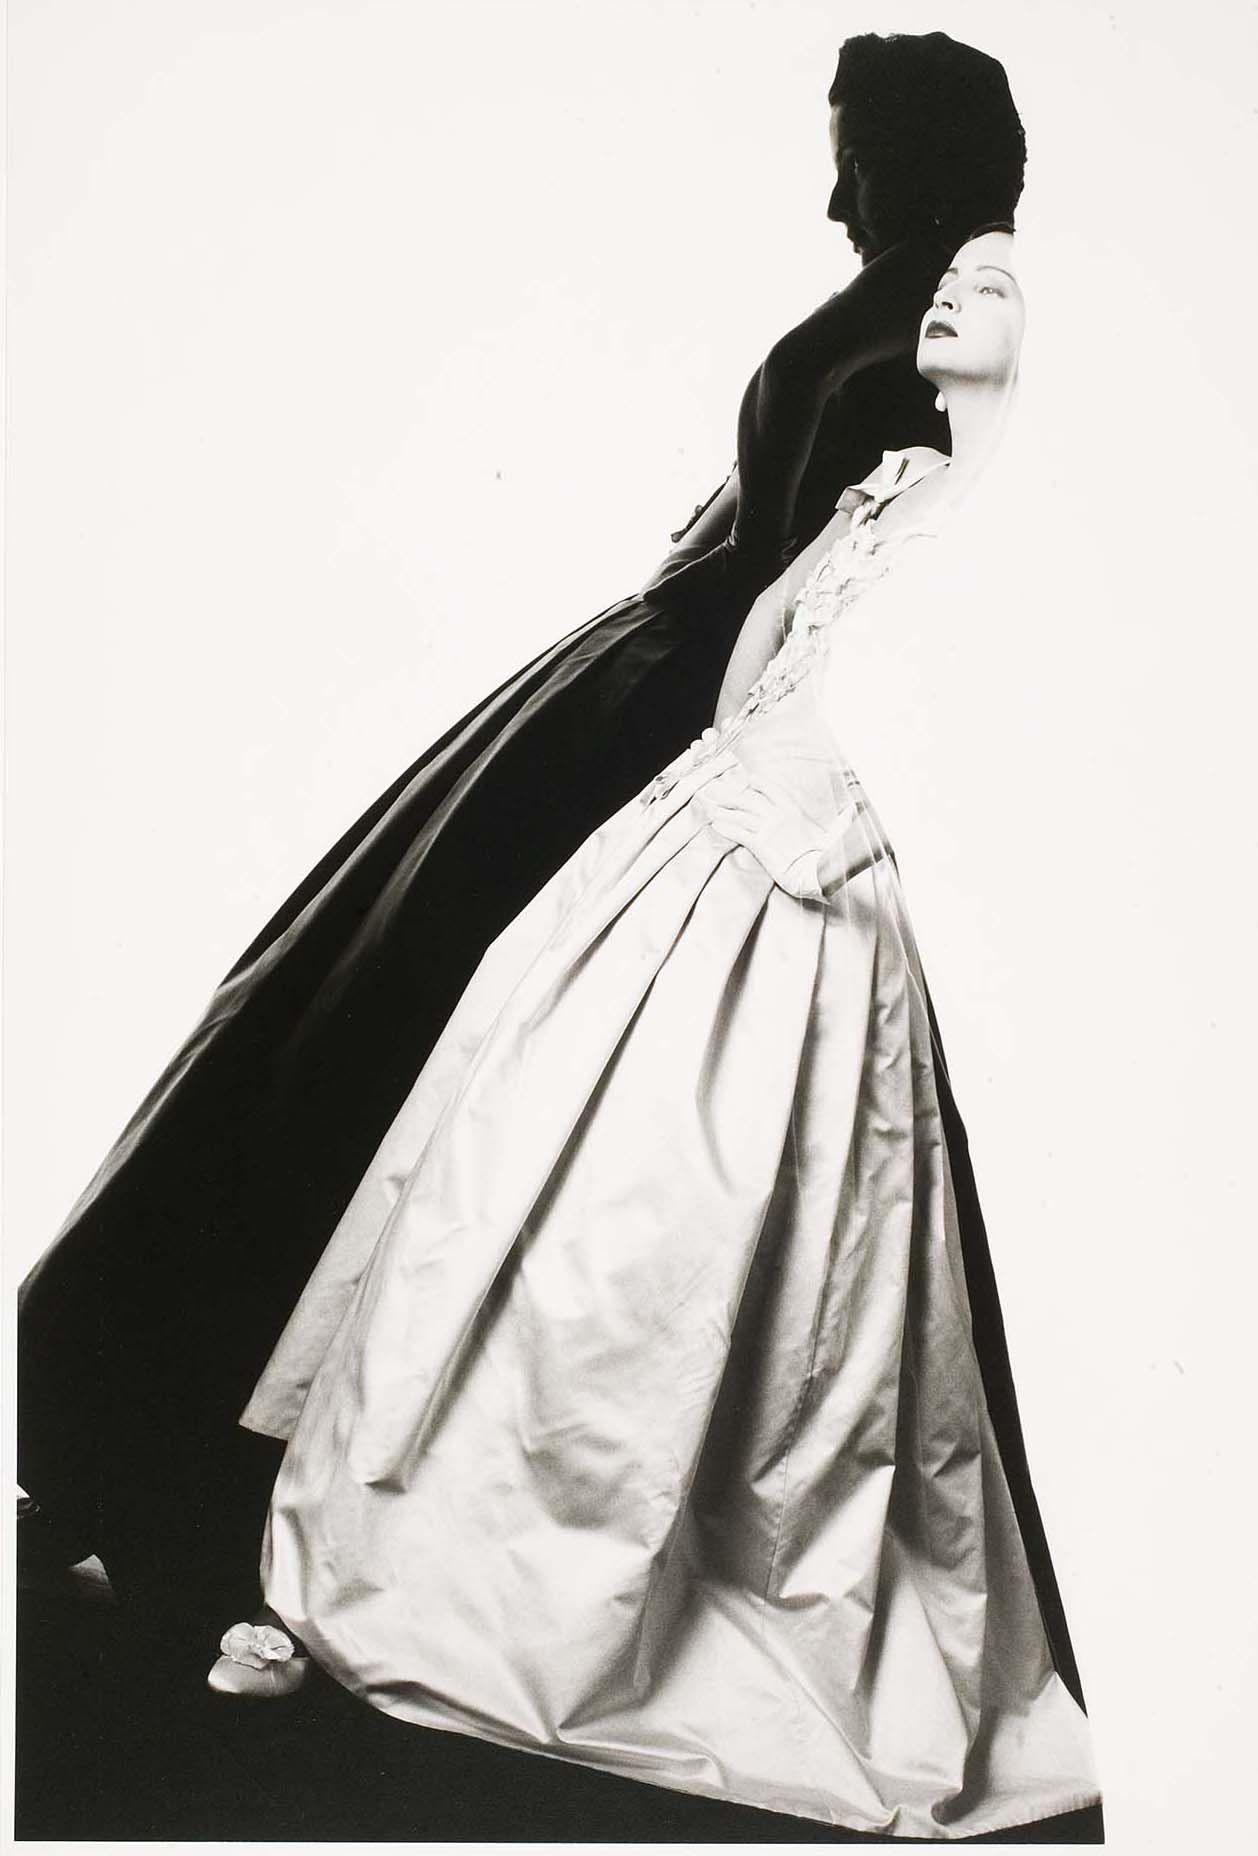 David Seidner, Betty Lago, Chanel, 1985